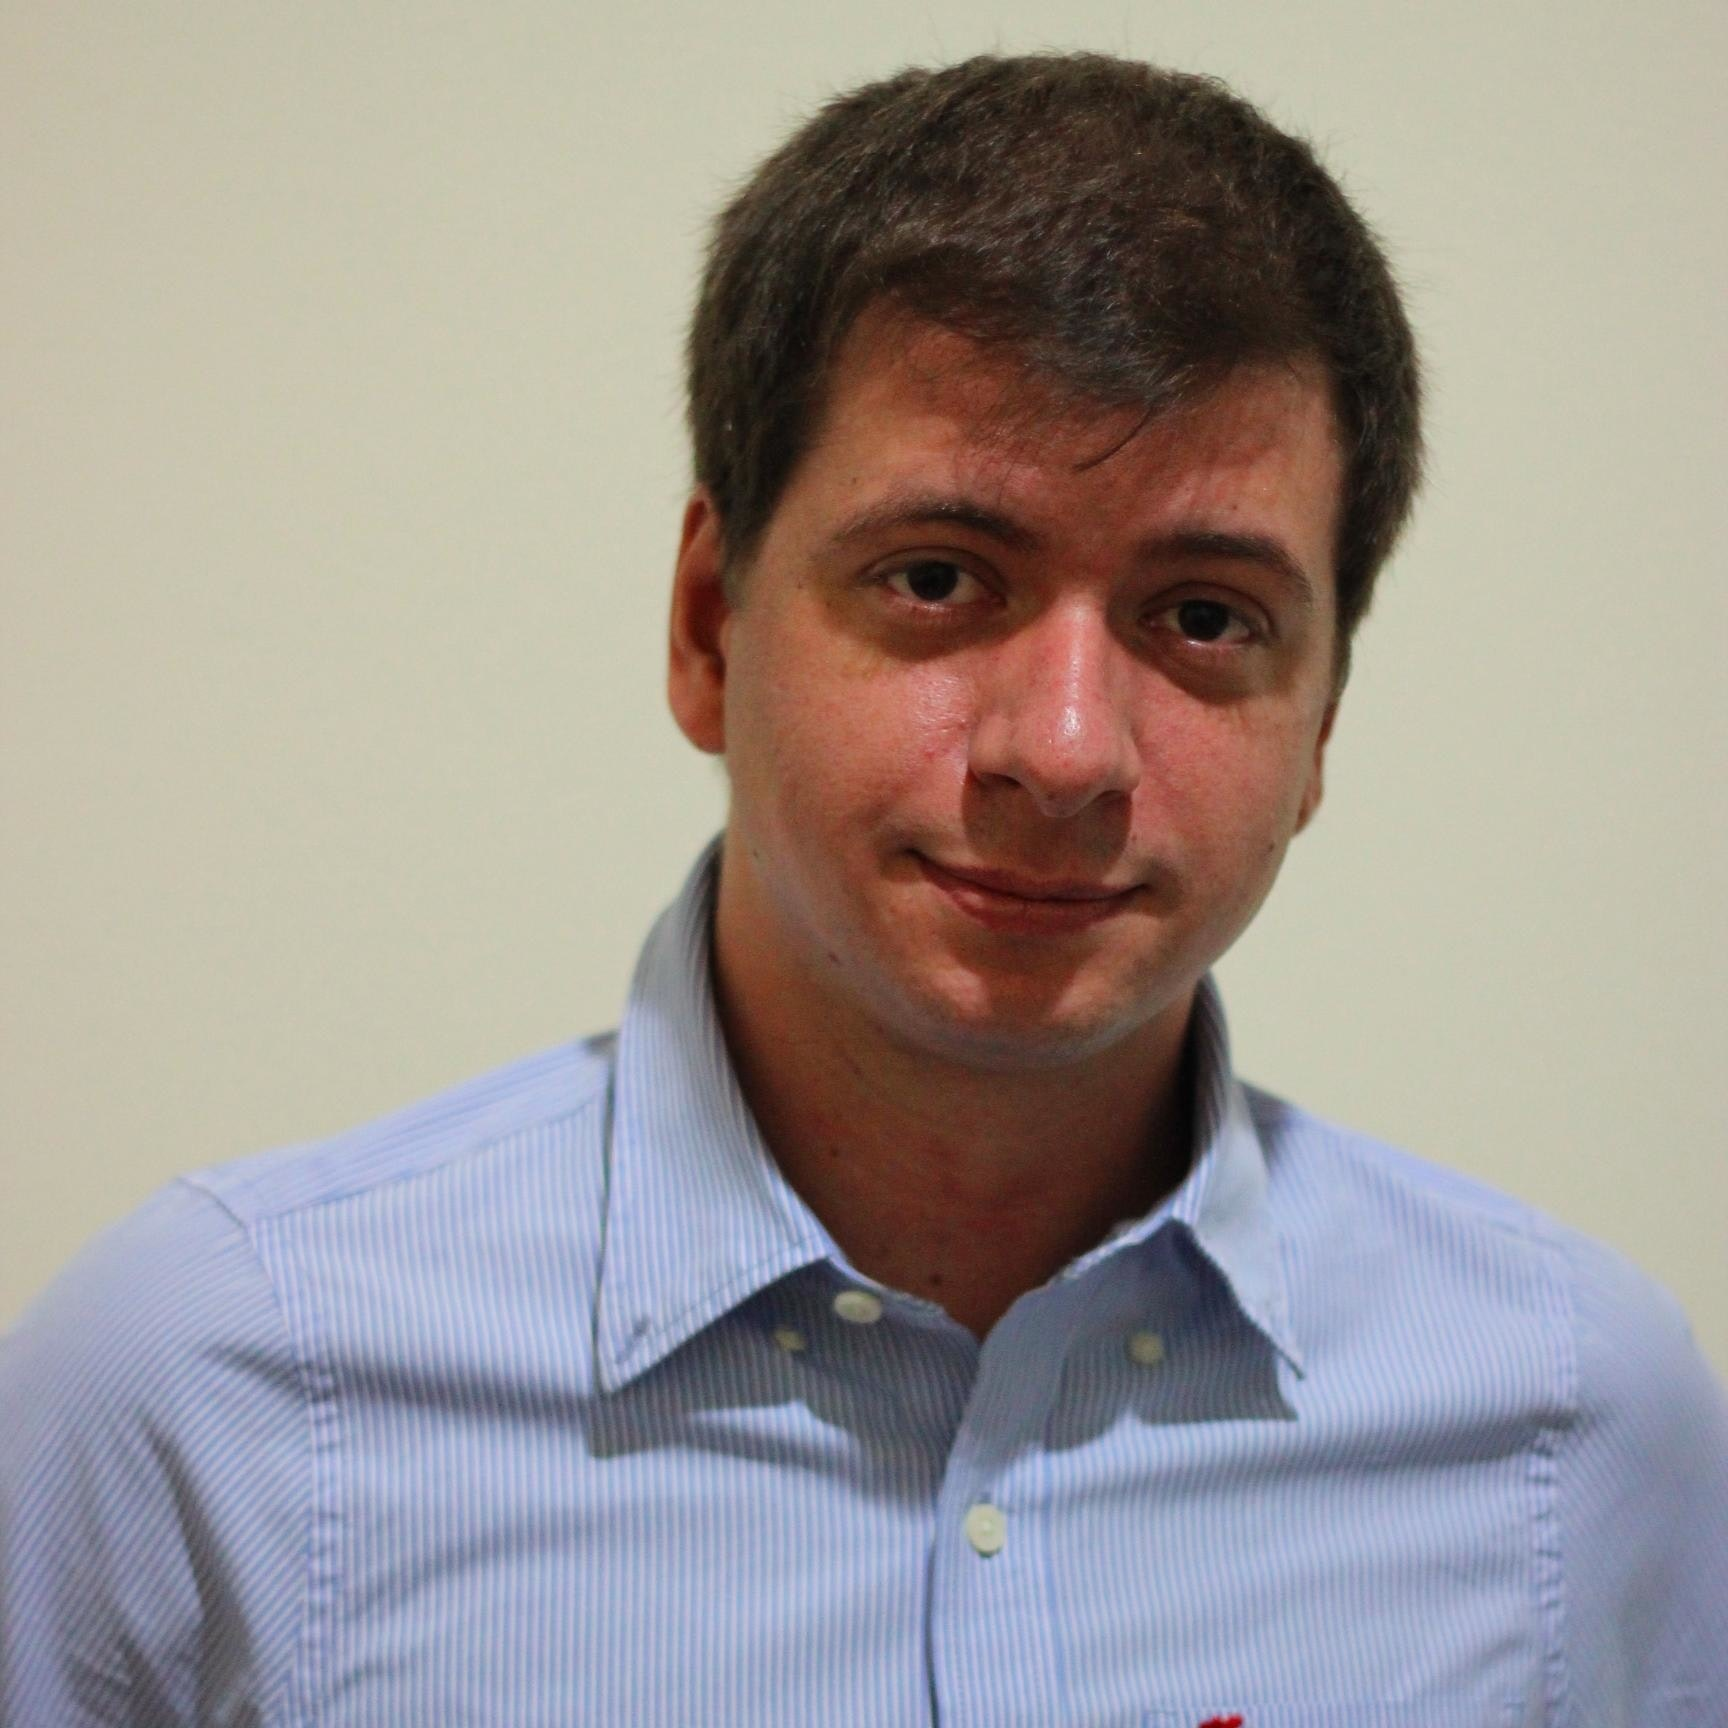 Luis Novo